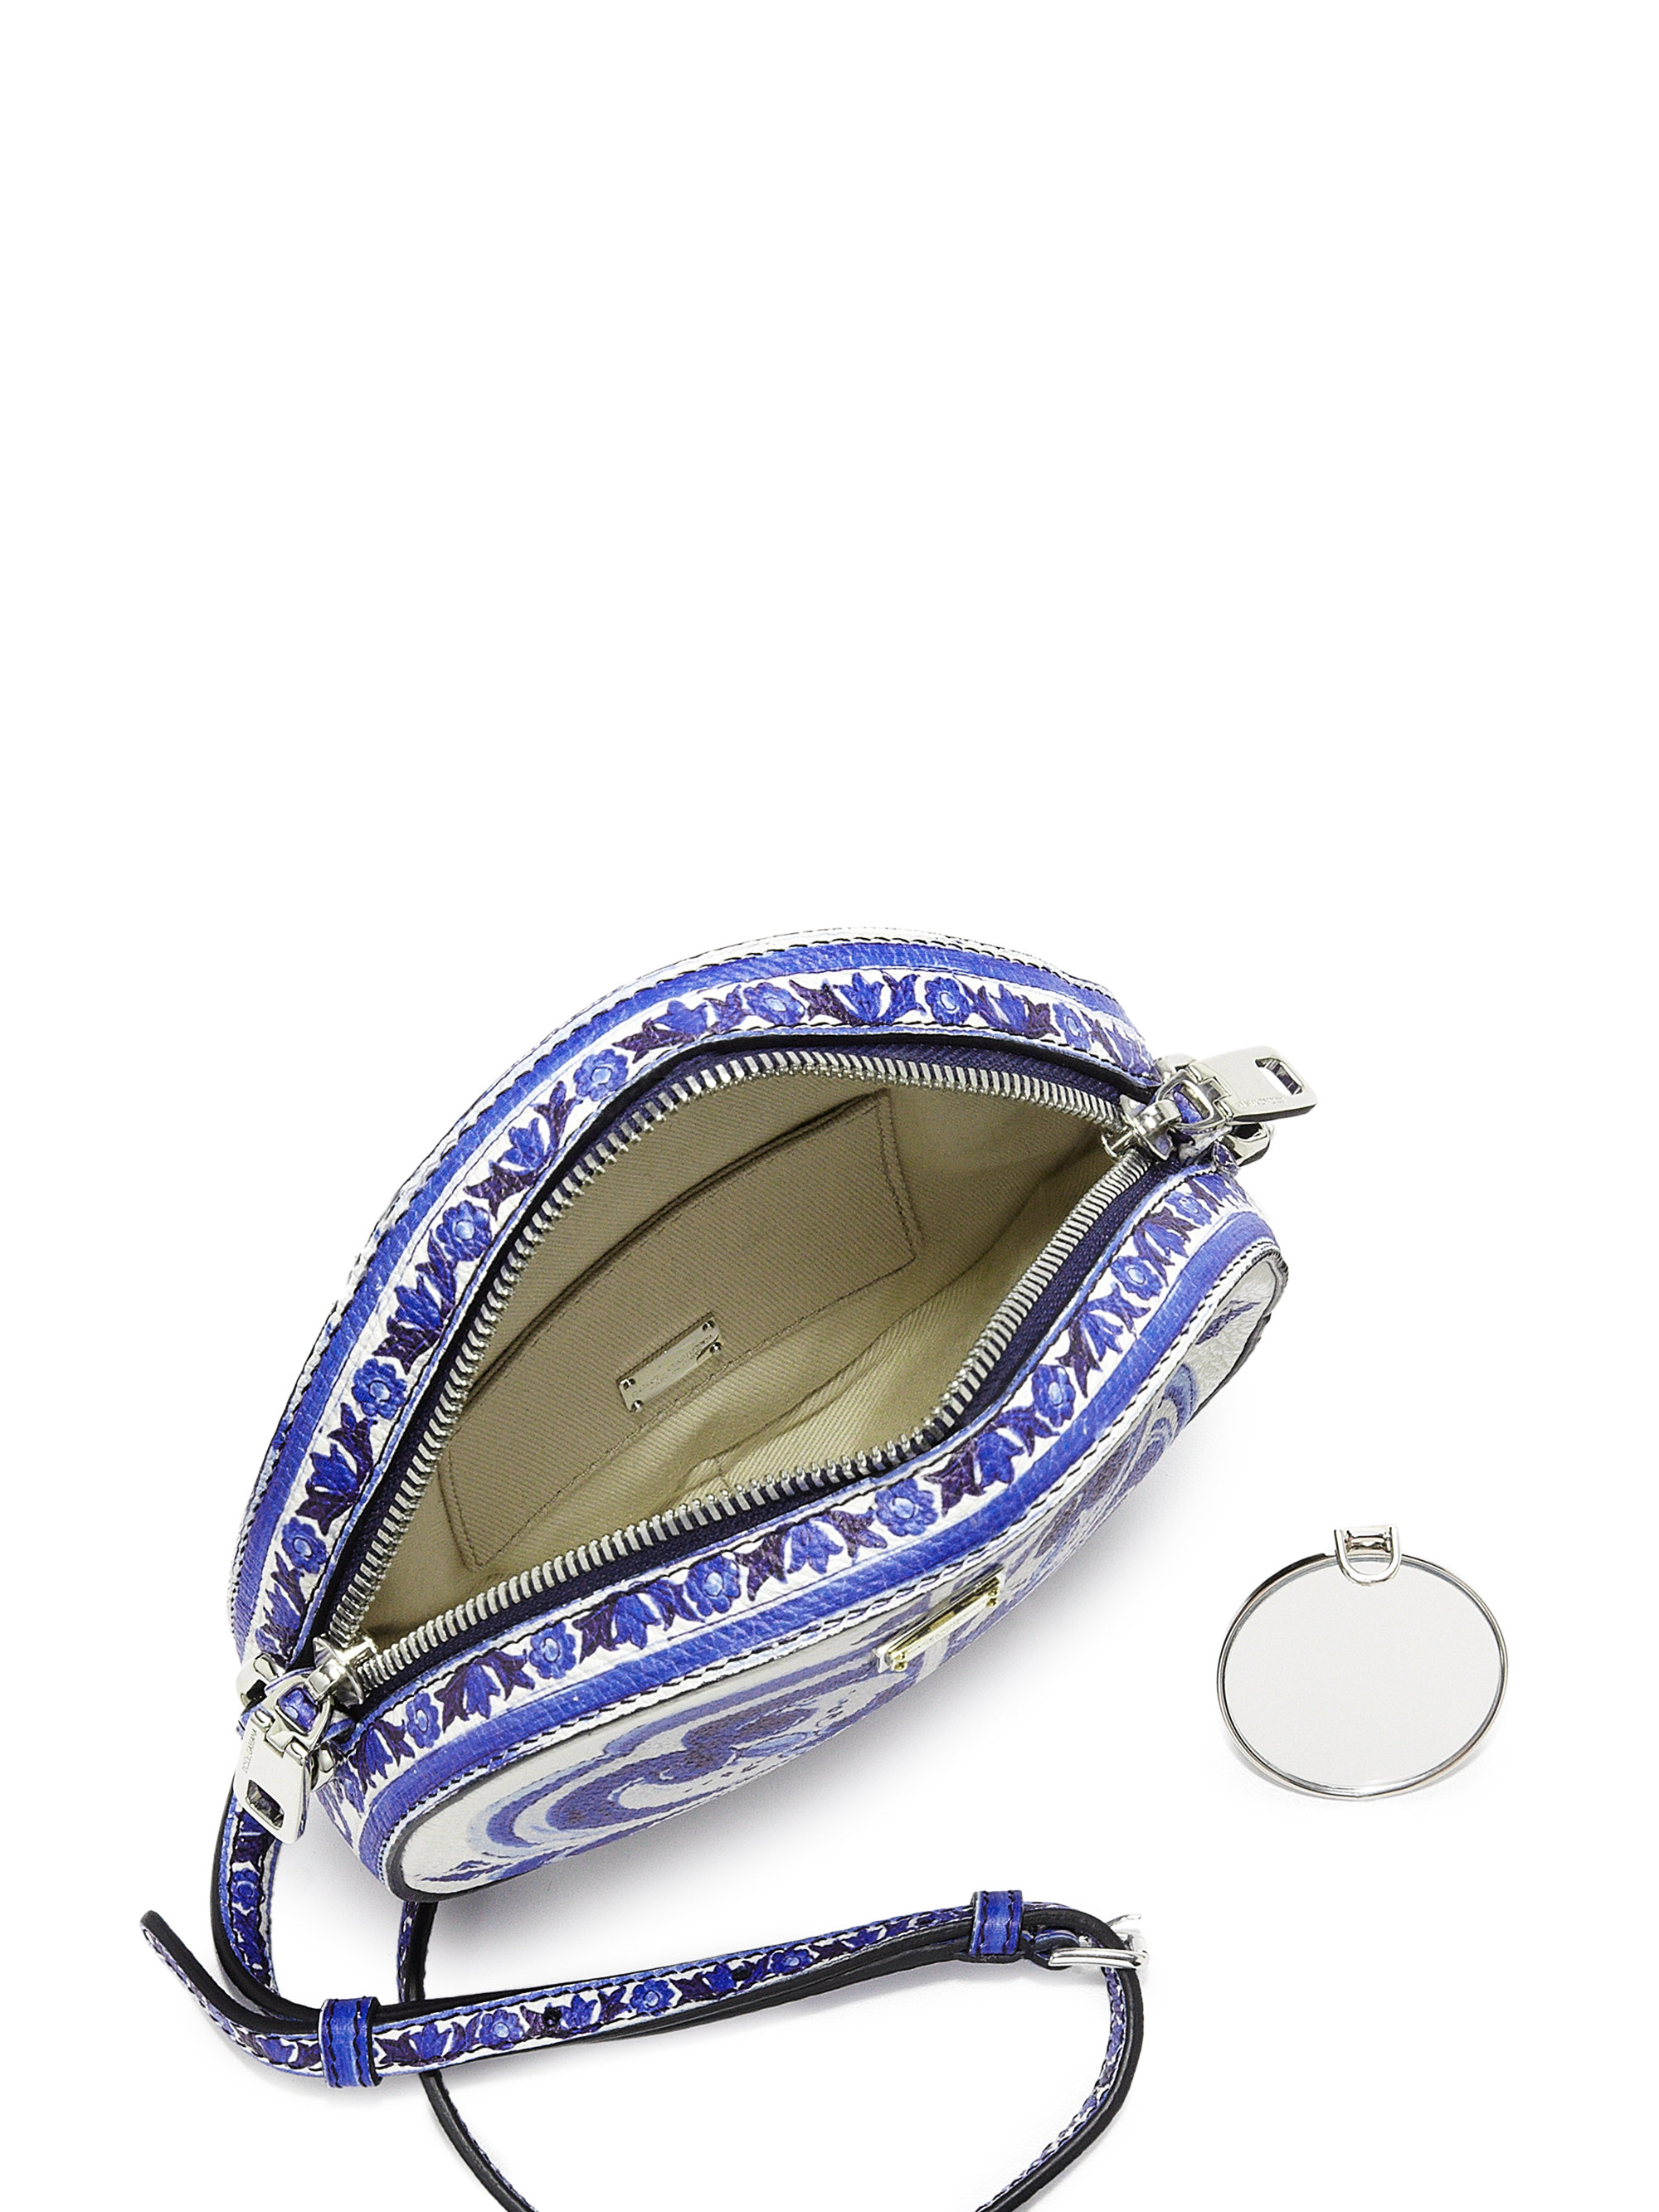 Lyst - Dolce   Gabbana Glam Italian Tile Textured Leather Crossbody ... d4442fb21abb3